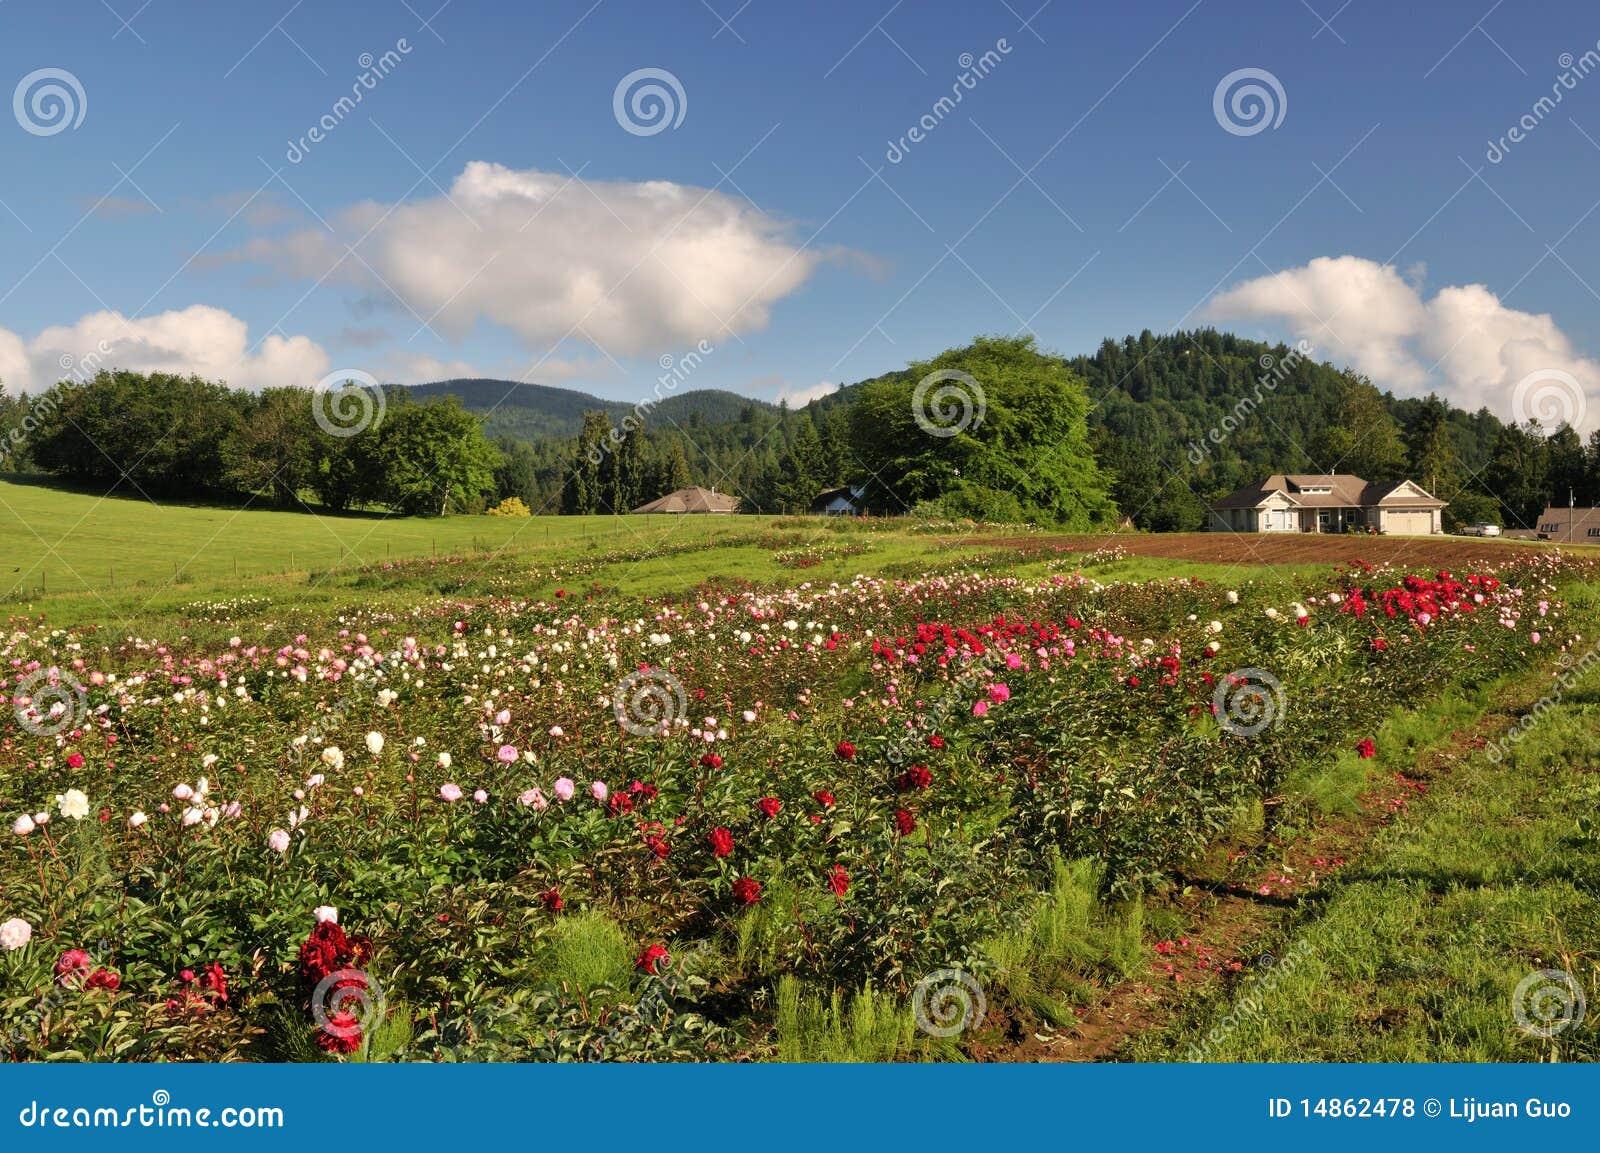 Flower farm in Mission, British Columbia